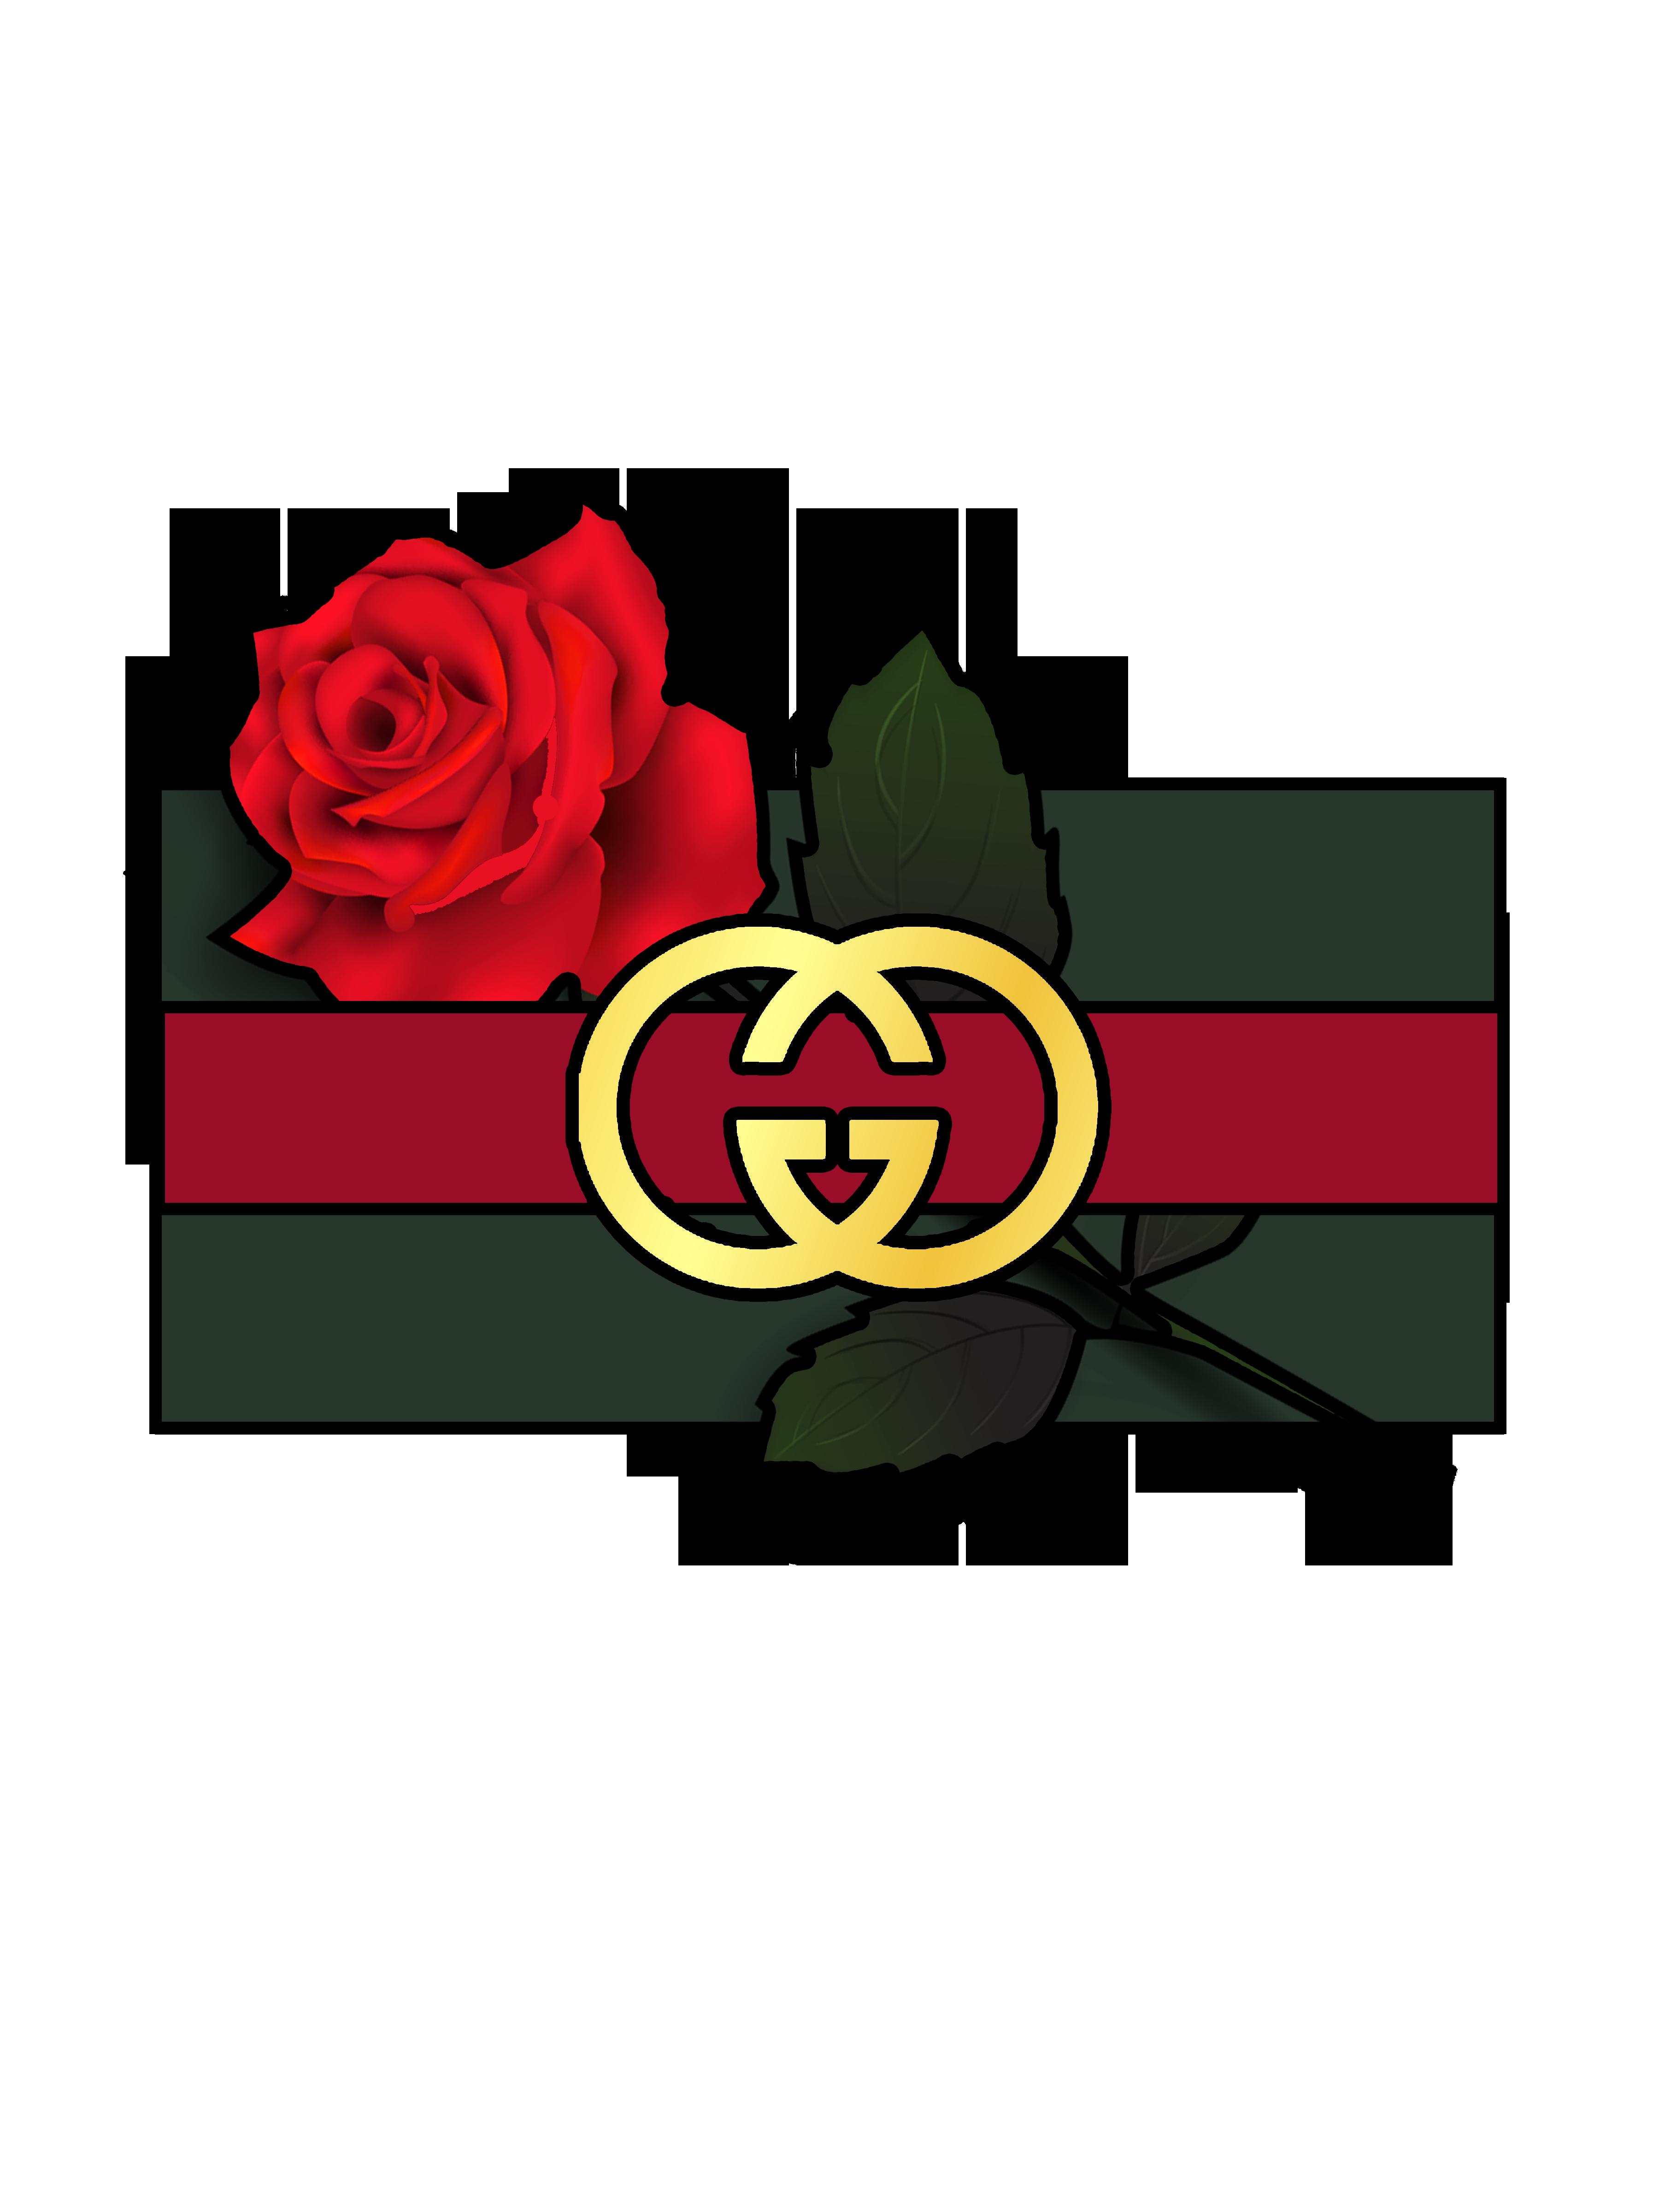 little gucci logo i made | Logos, Sport team logos ...